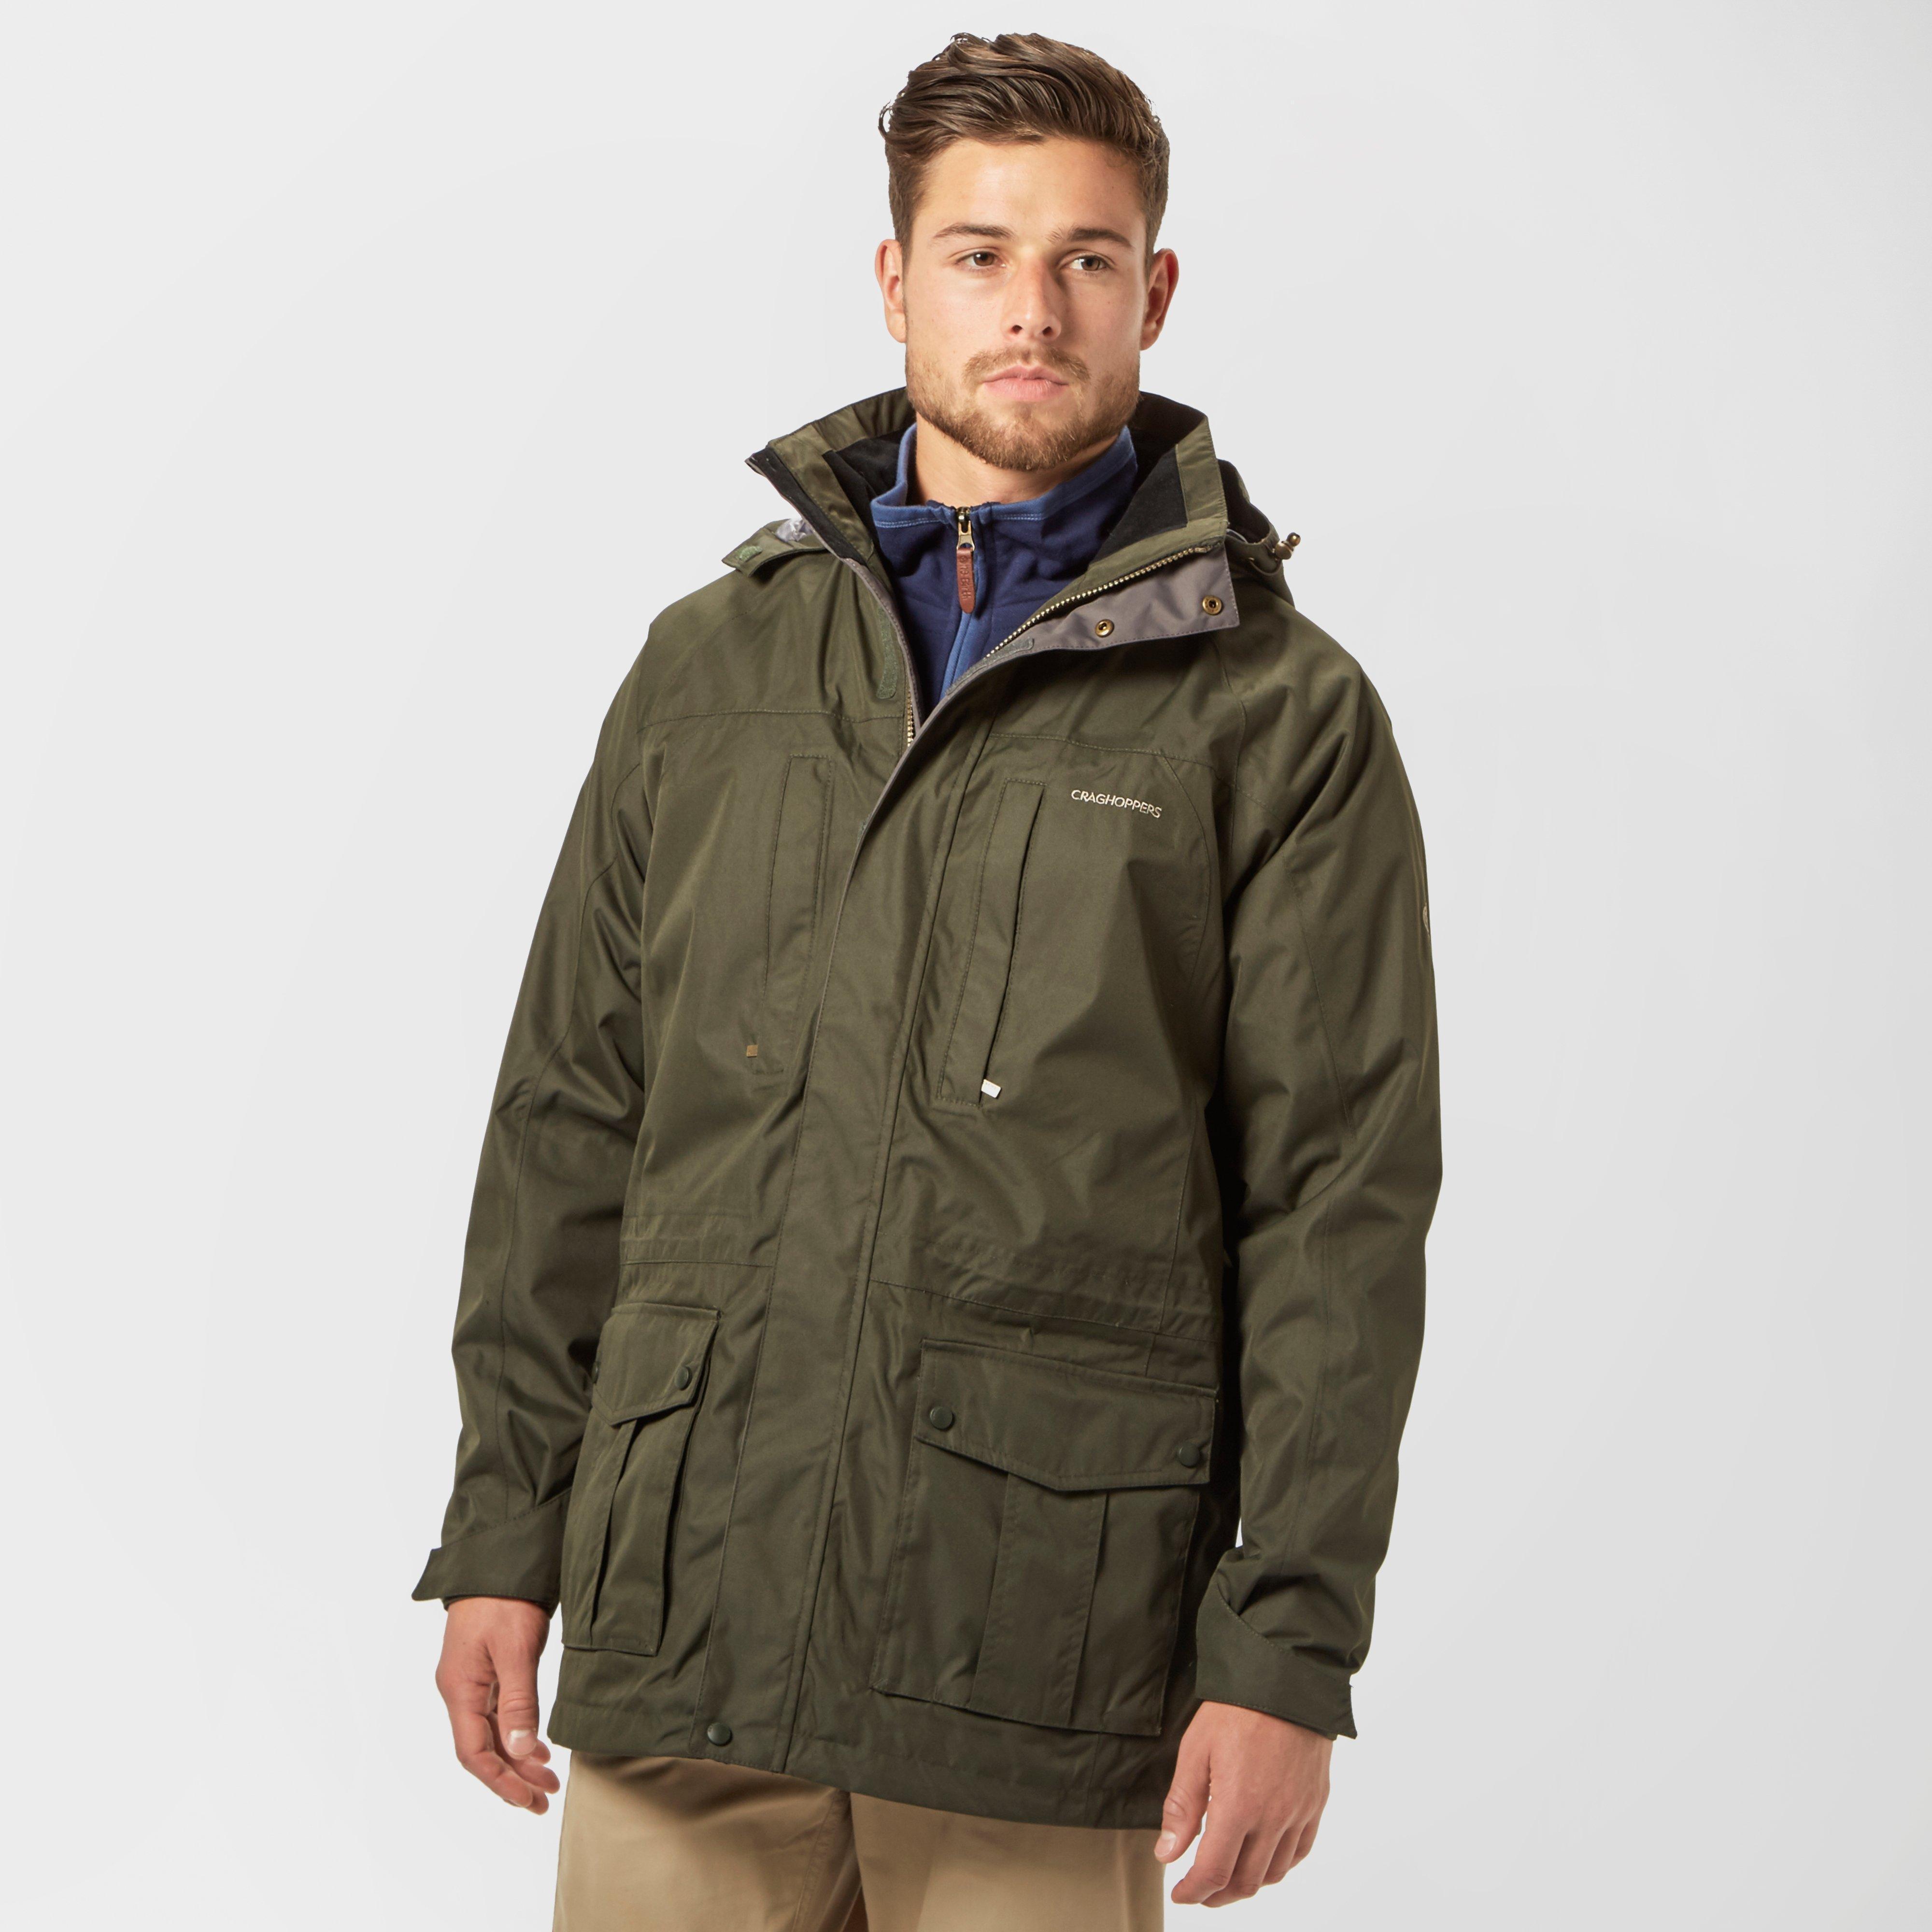 Craghoppers Kiwi Long Jacket – Men's